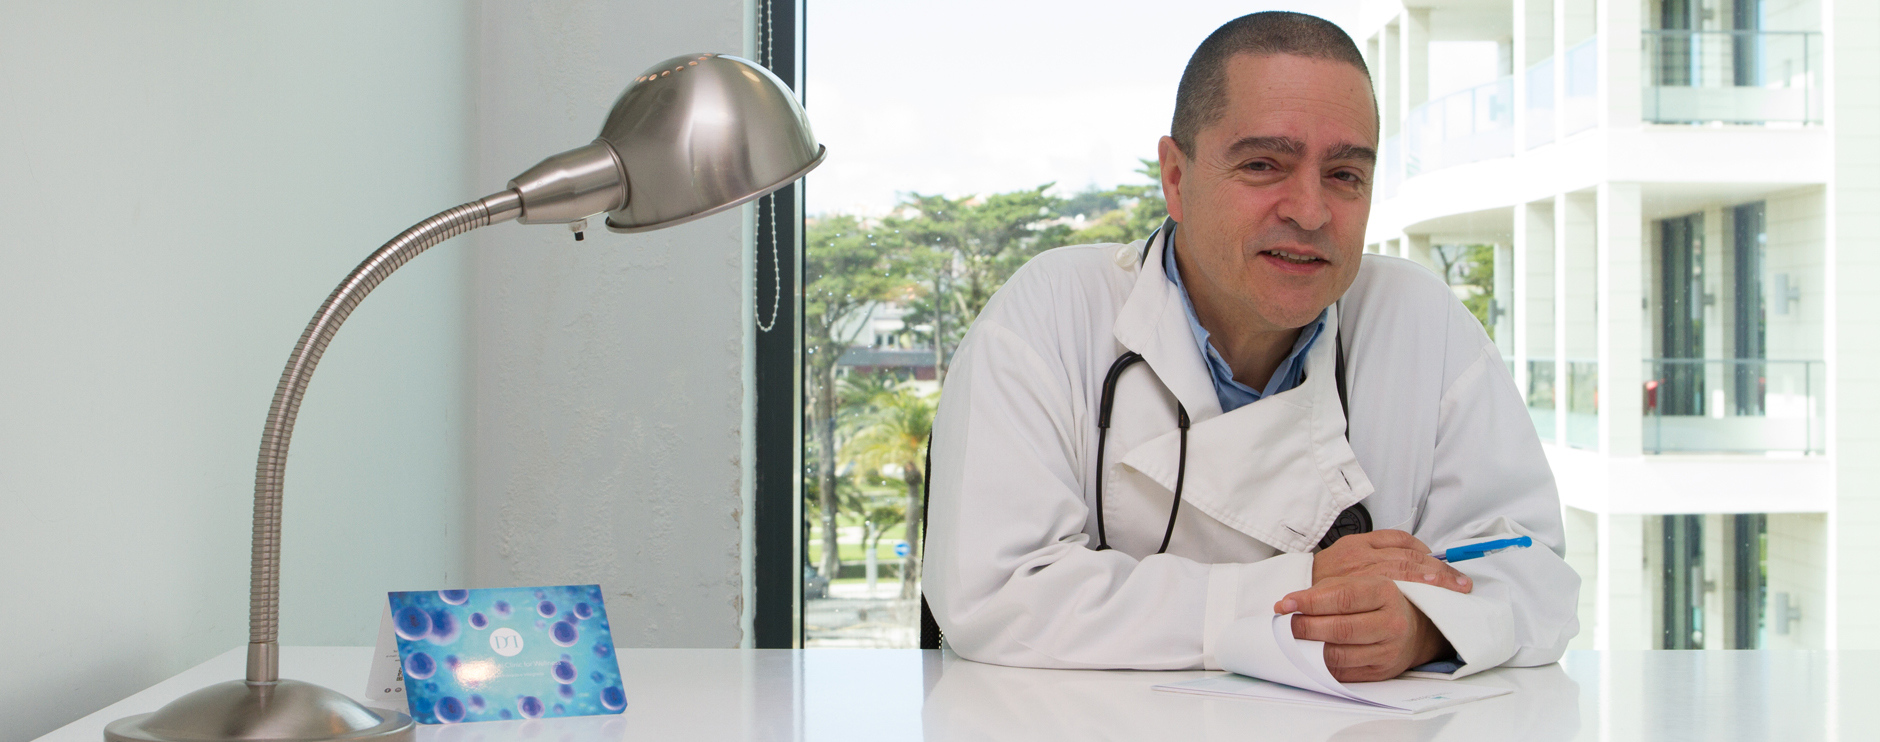 Pedro MR Veiga